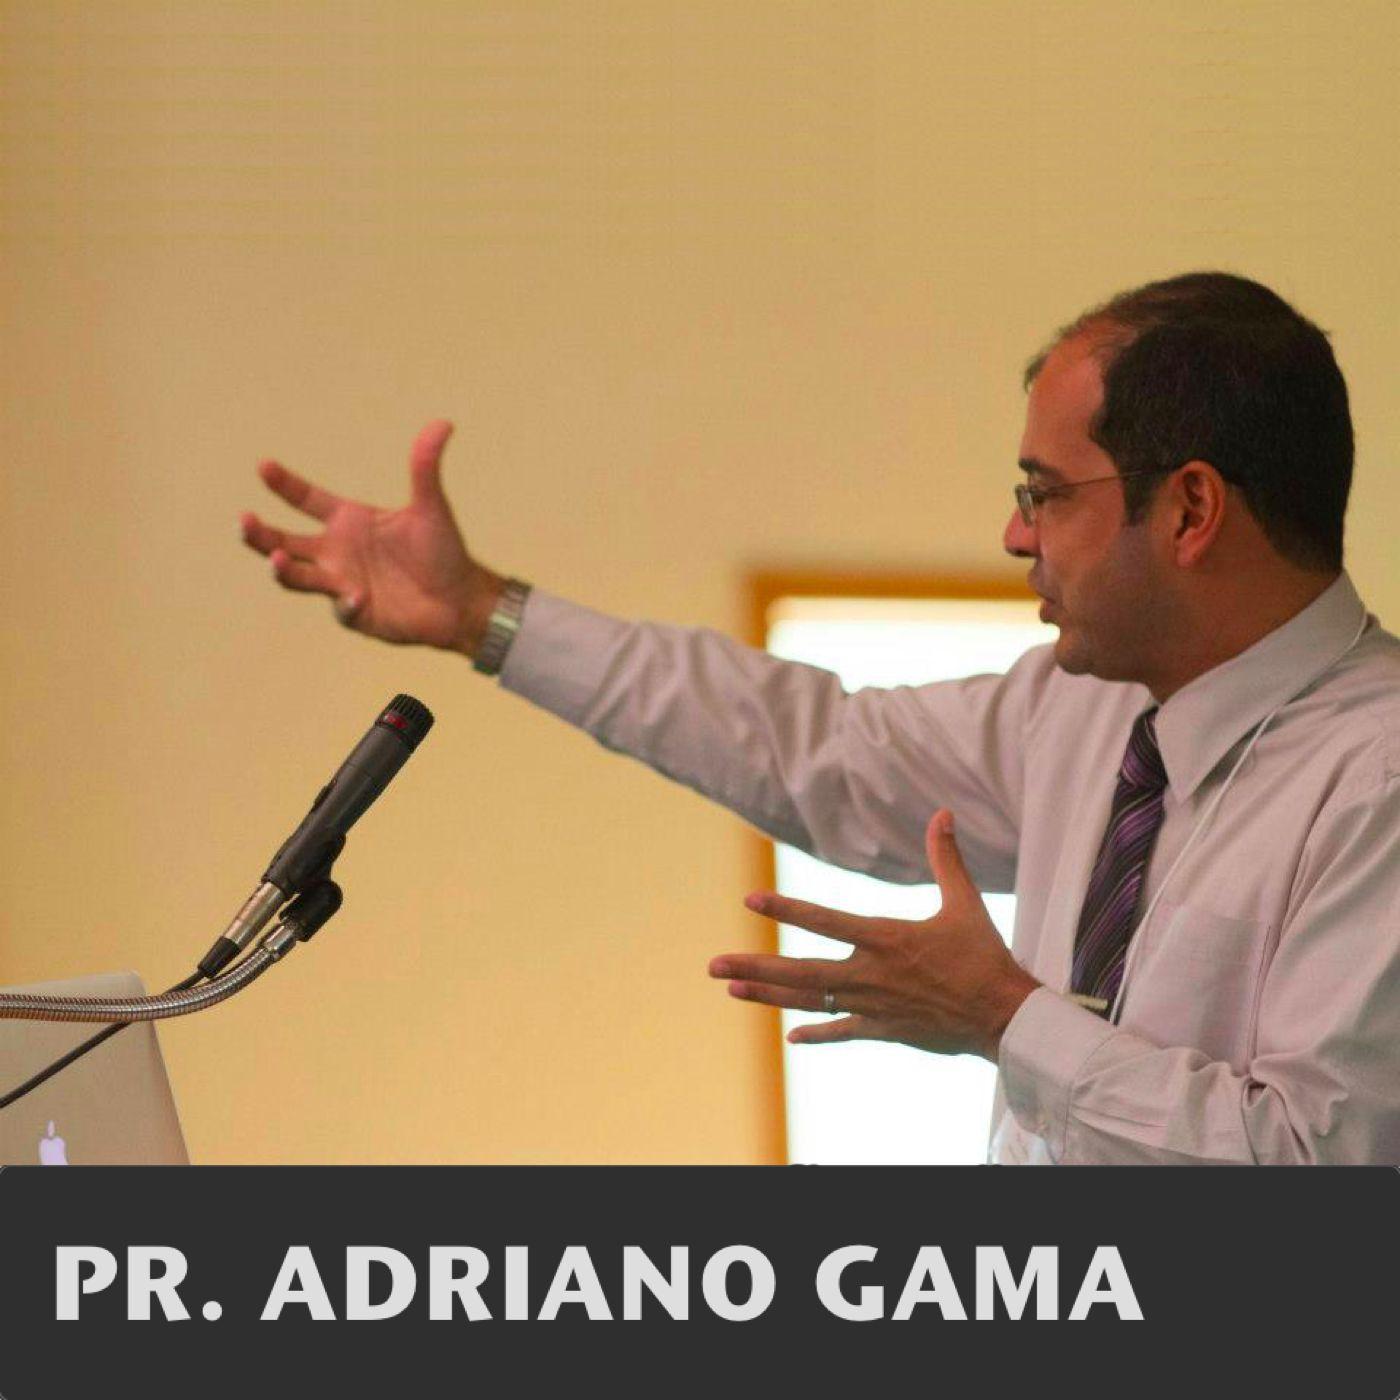 Pastor Adriano Gama